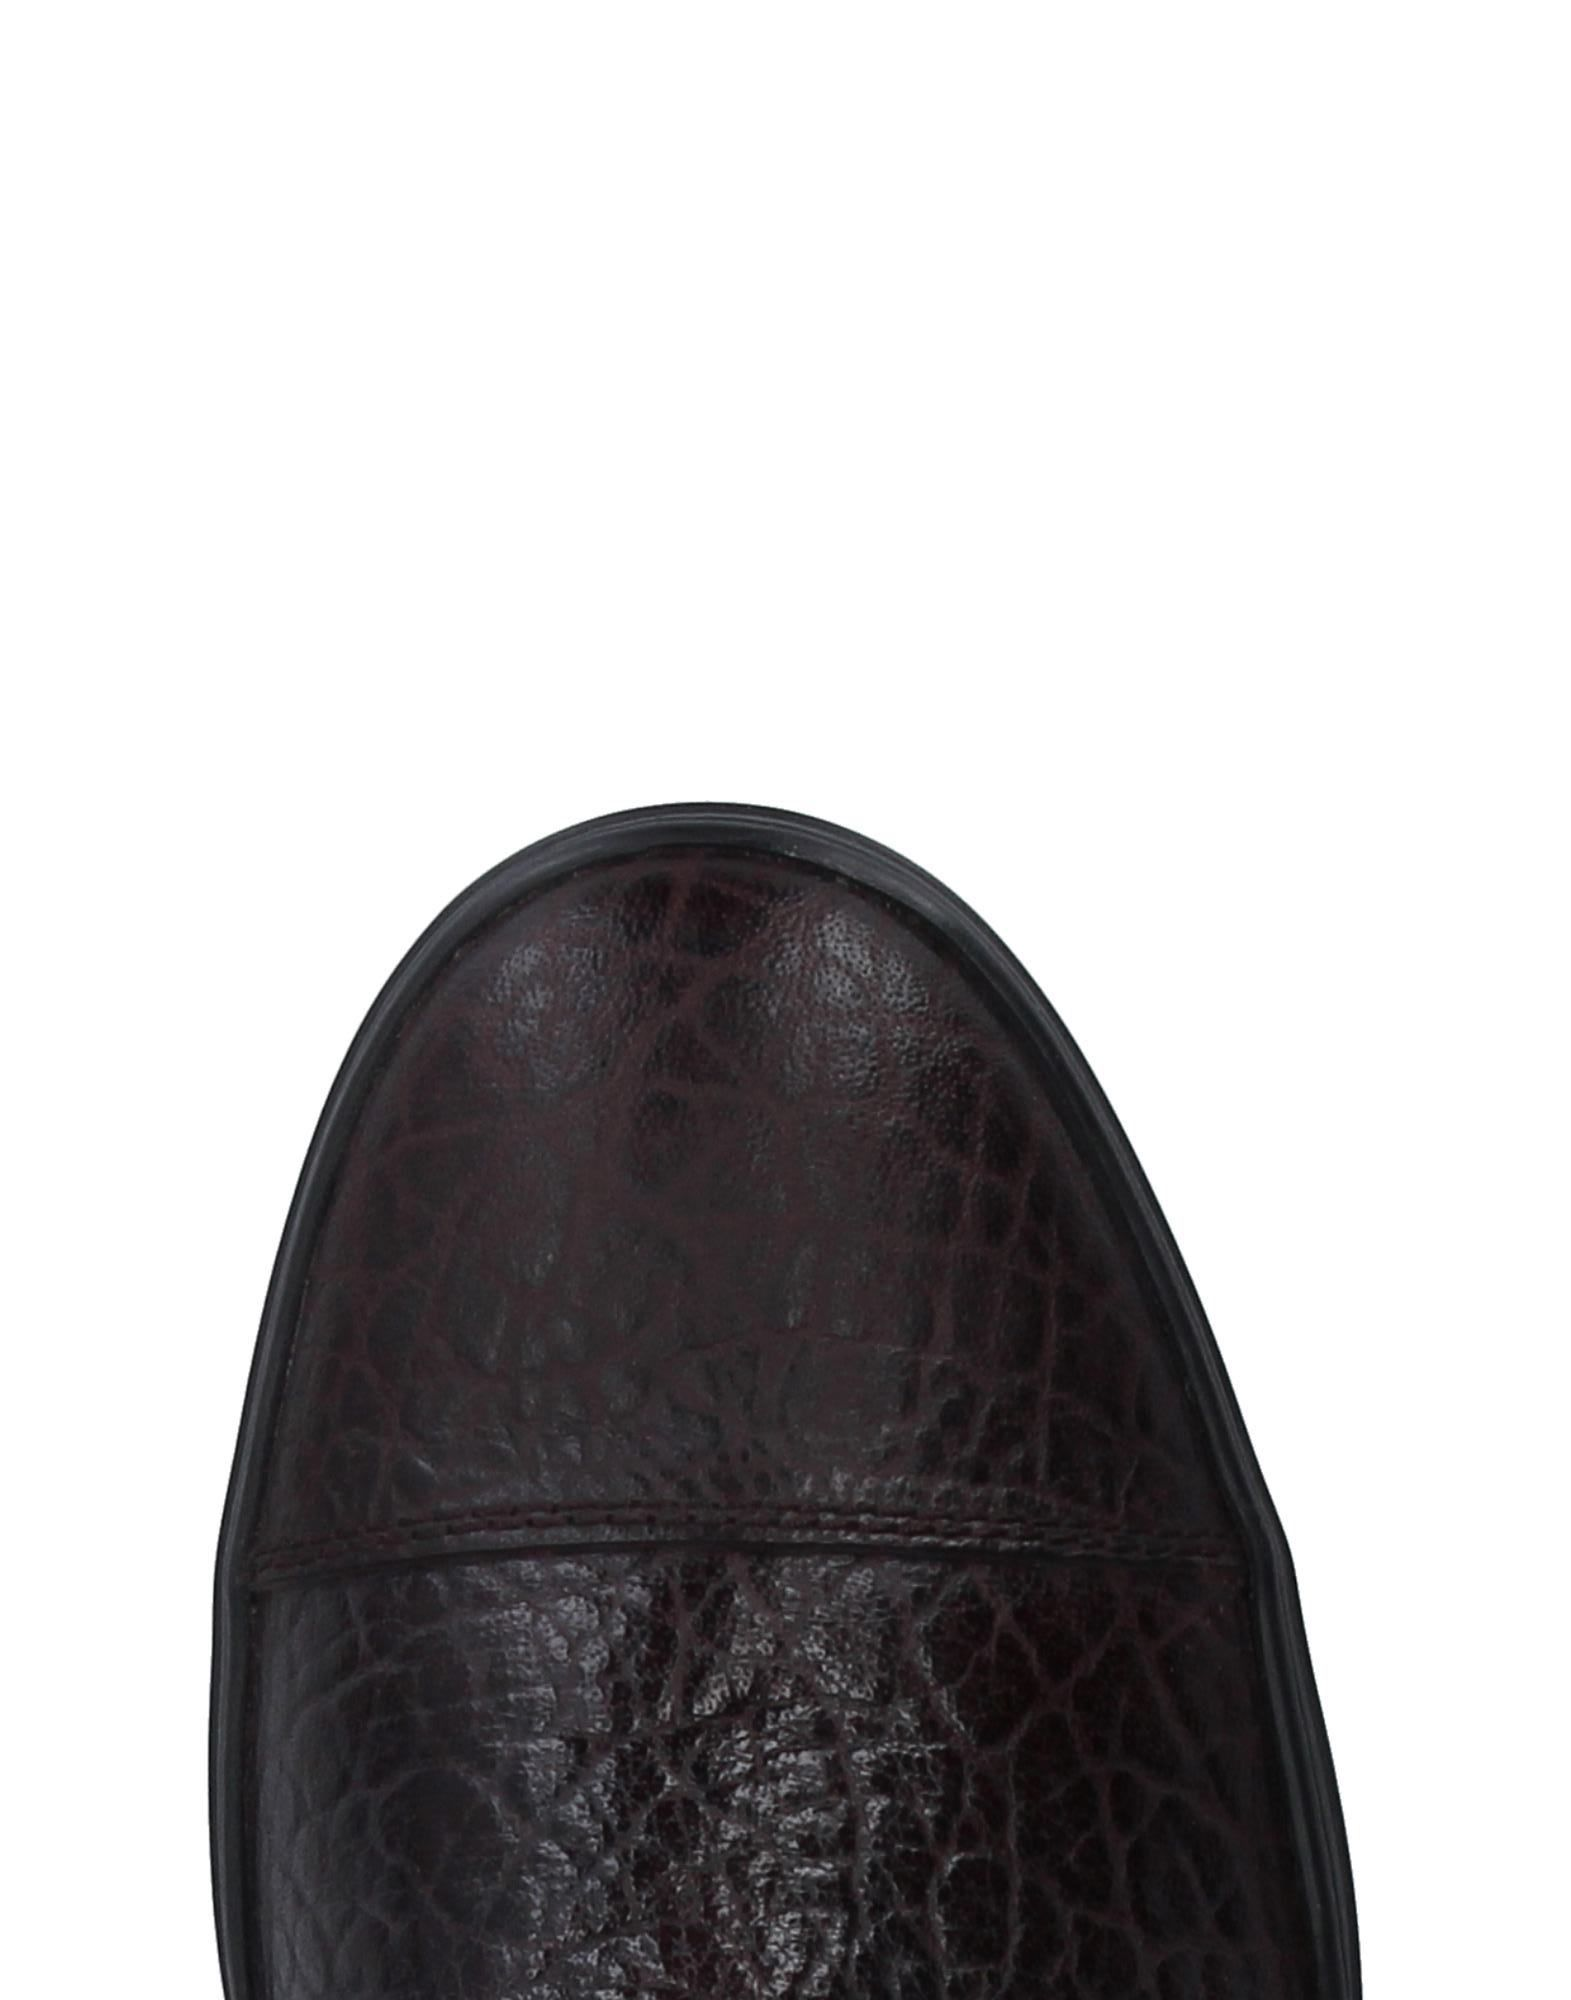 Tod's 11284396AK Sneakers Herren  11284396AK Tod's Gute Qualität beliebte Schuhe 1cdf1c